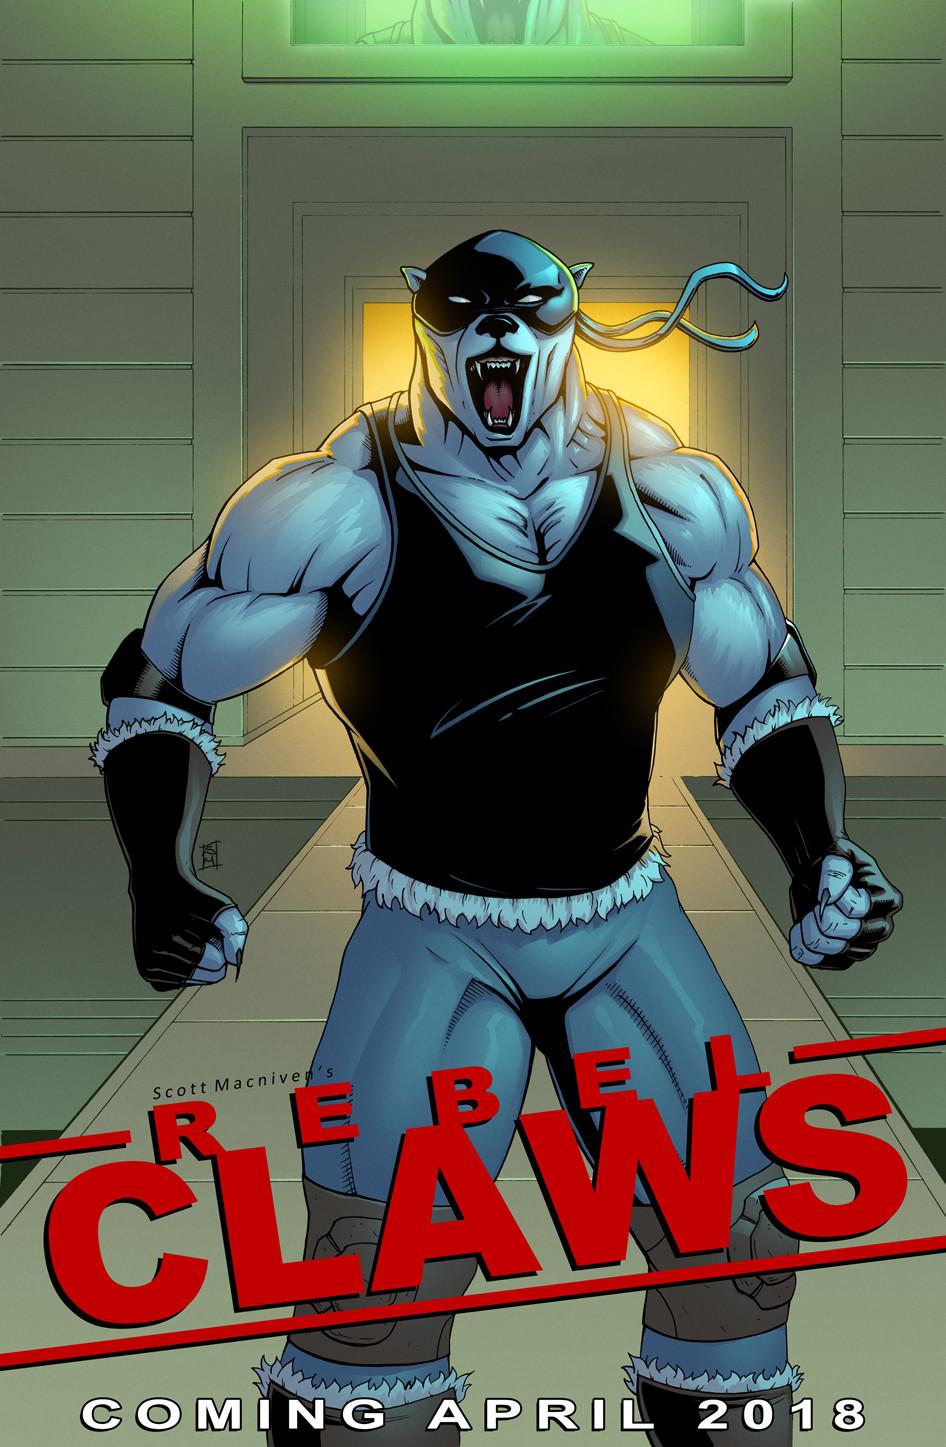 Maksim strelkov rebel claws 1 poster lowres